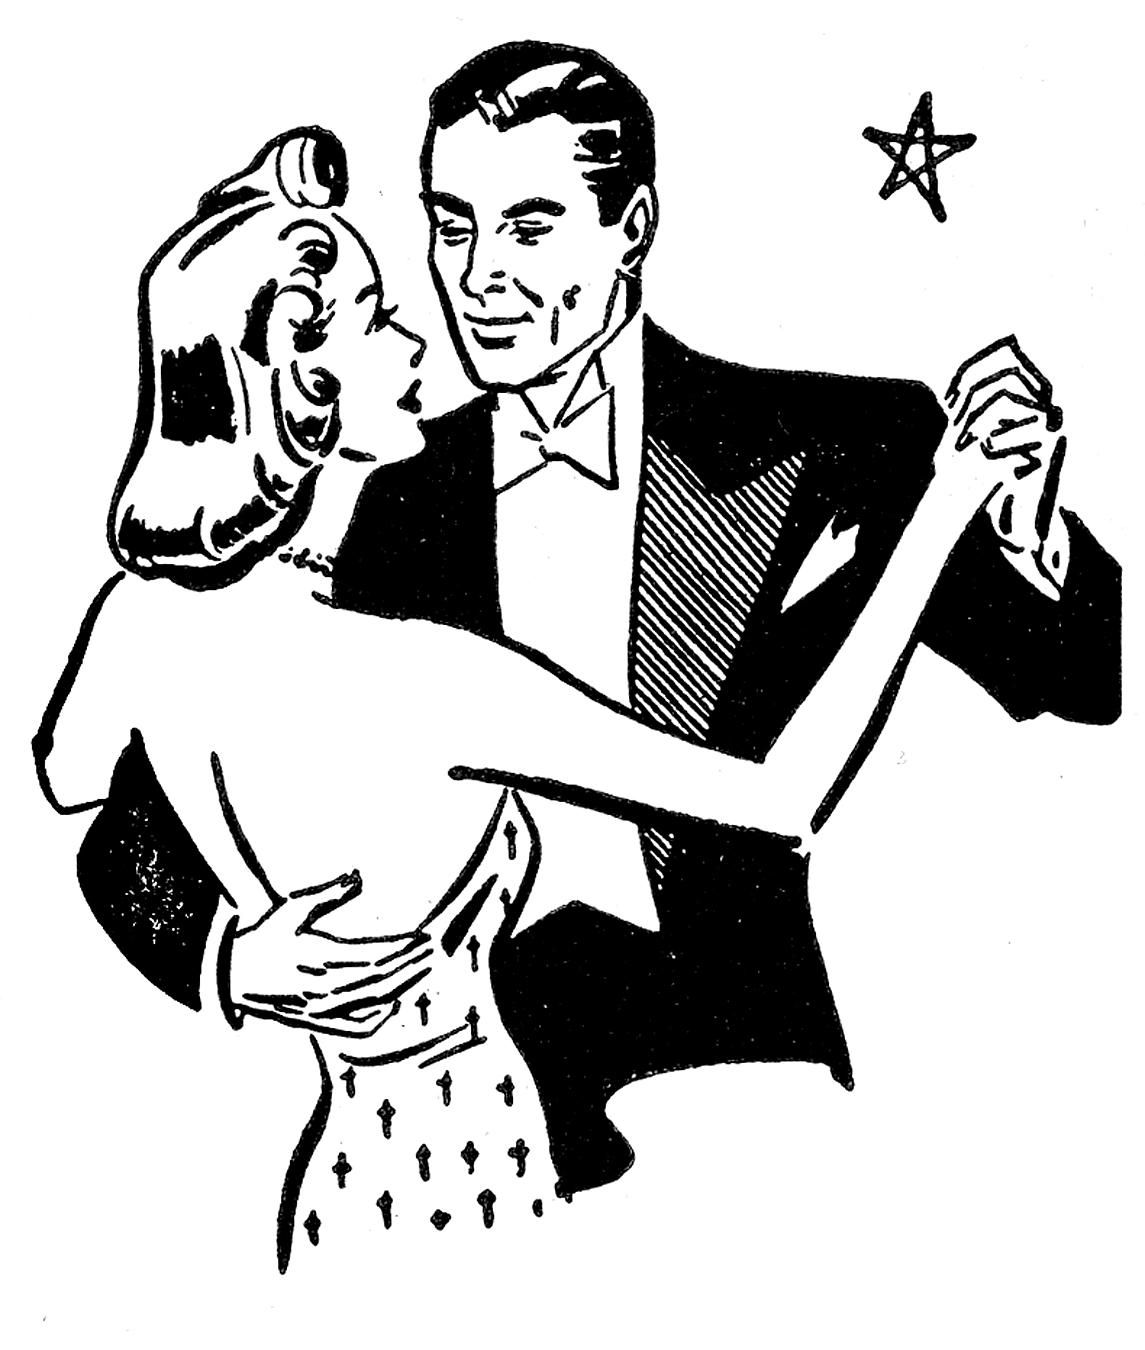 Retro Clip Art - Couples - Anniversary - The Graphics Fairy